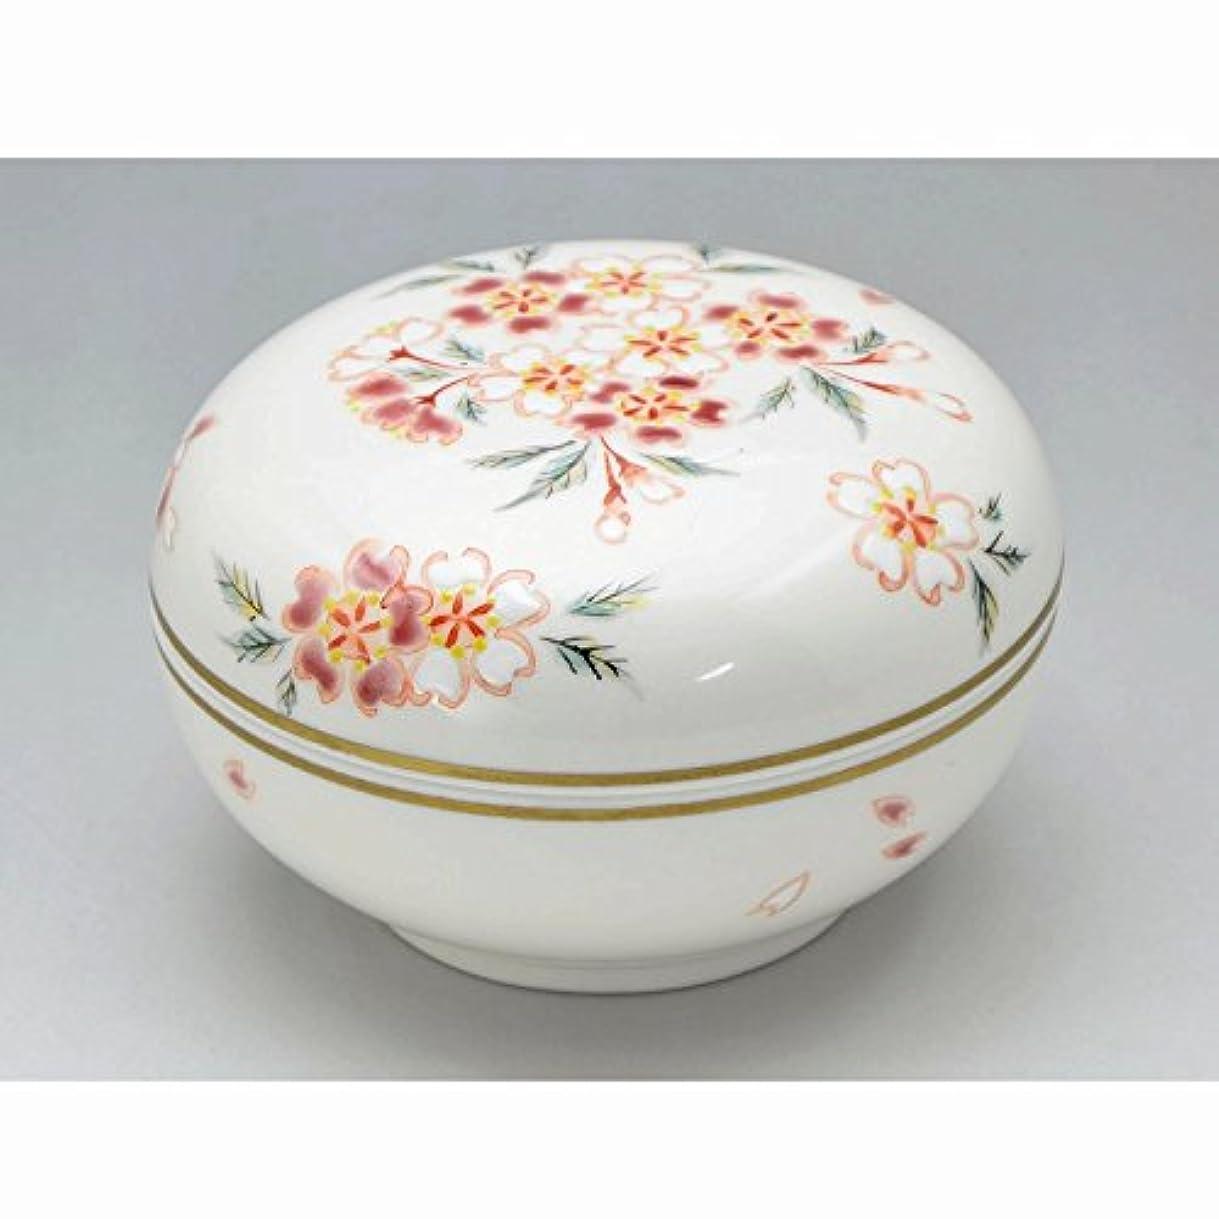 平行仮装自然公園京焼?清水焼 磁器 香合 花桜 紙箱入 Kiyomizu-kyo yaki ware. Japanese porcelain kogo incense burner hanazakura with paper box.